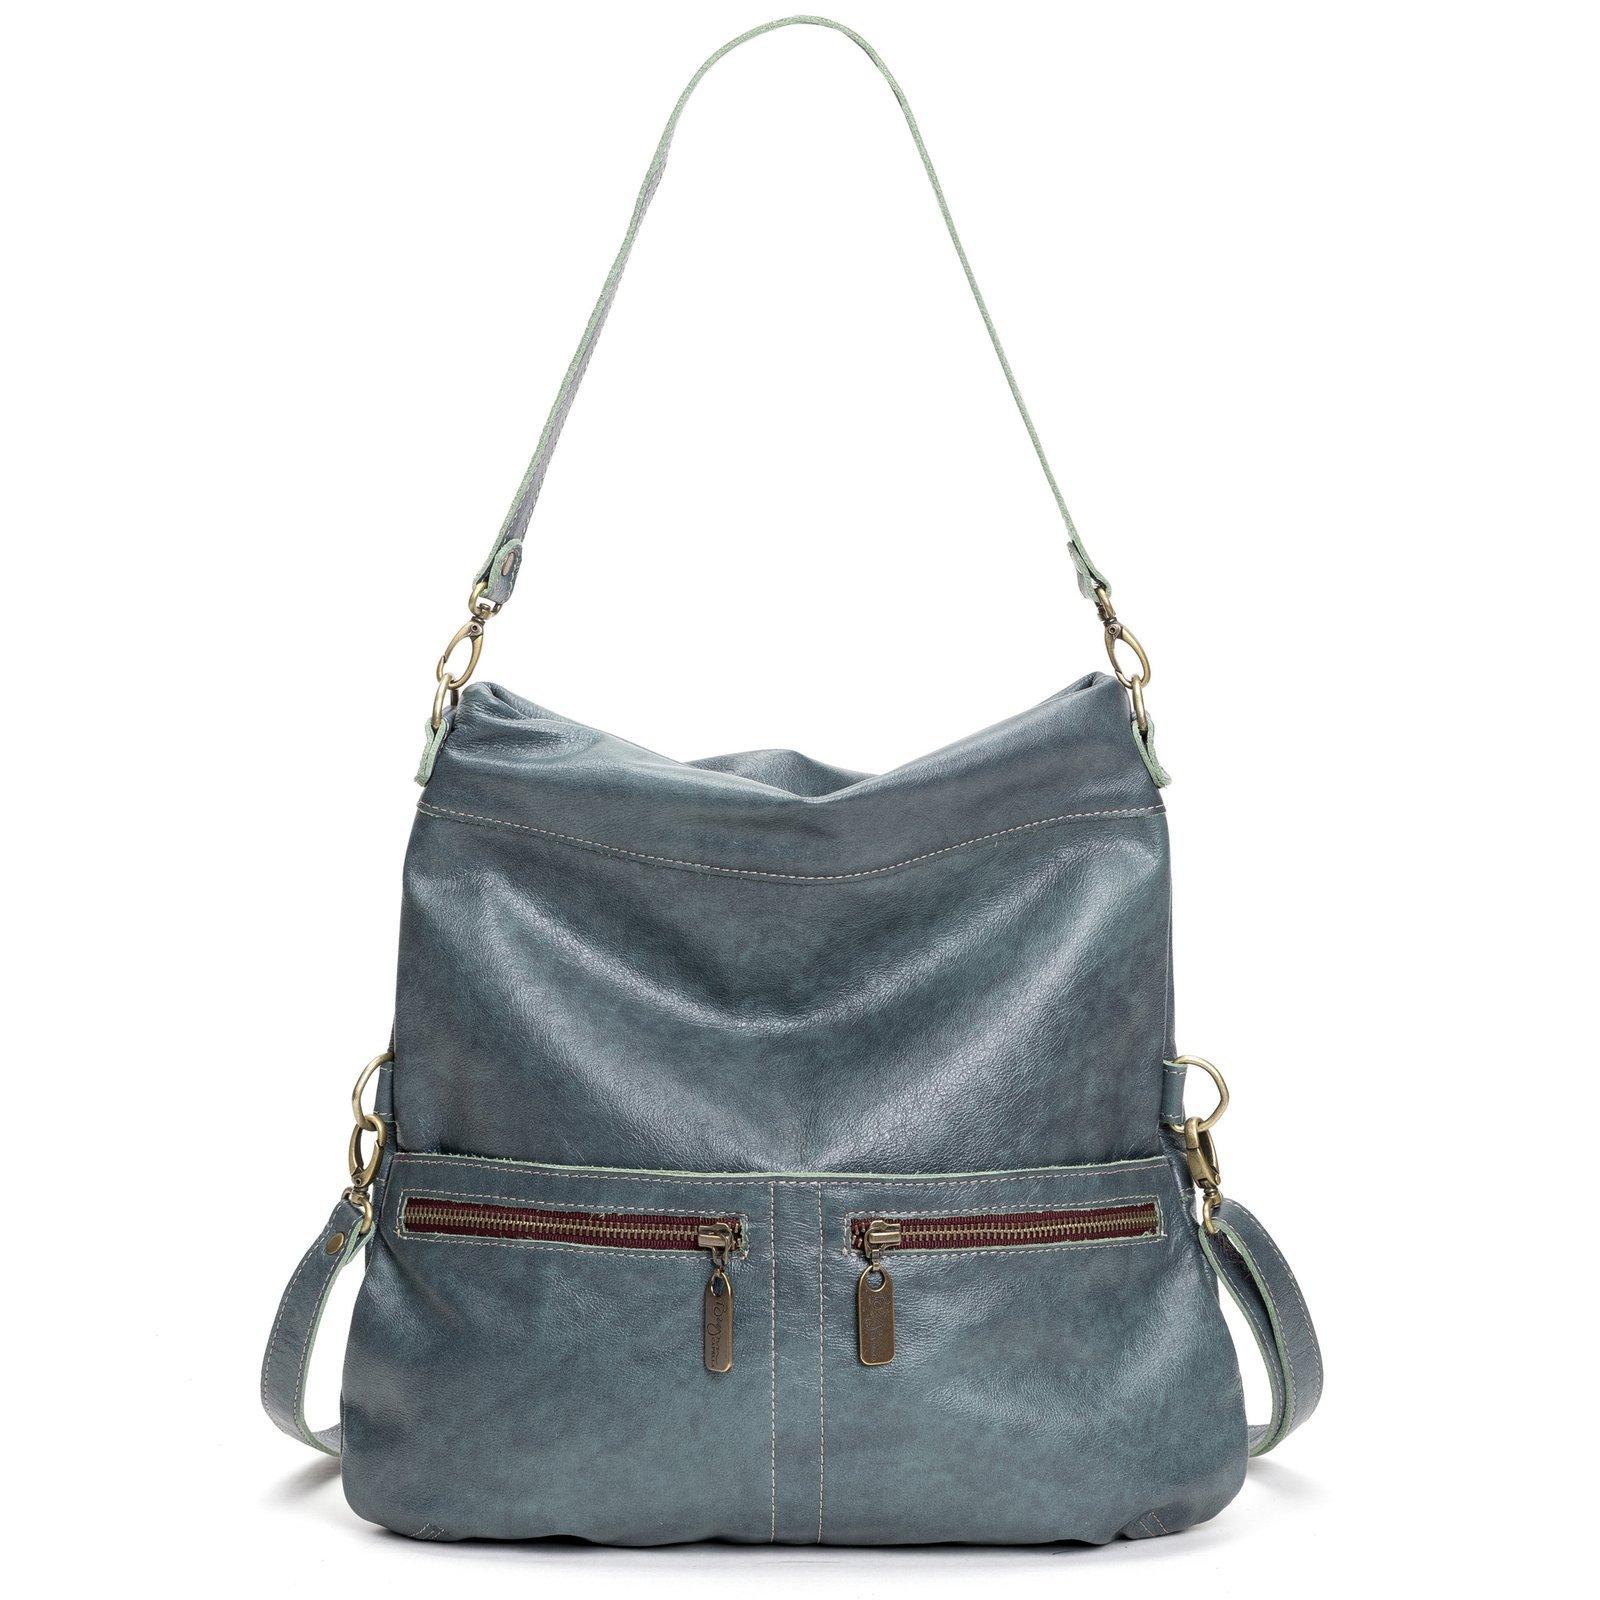 Medium Navy Italian Leather Crossbody Versatile Handbag